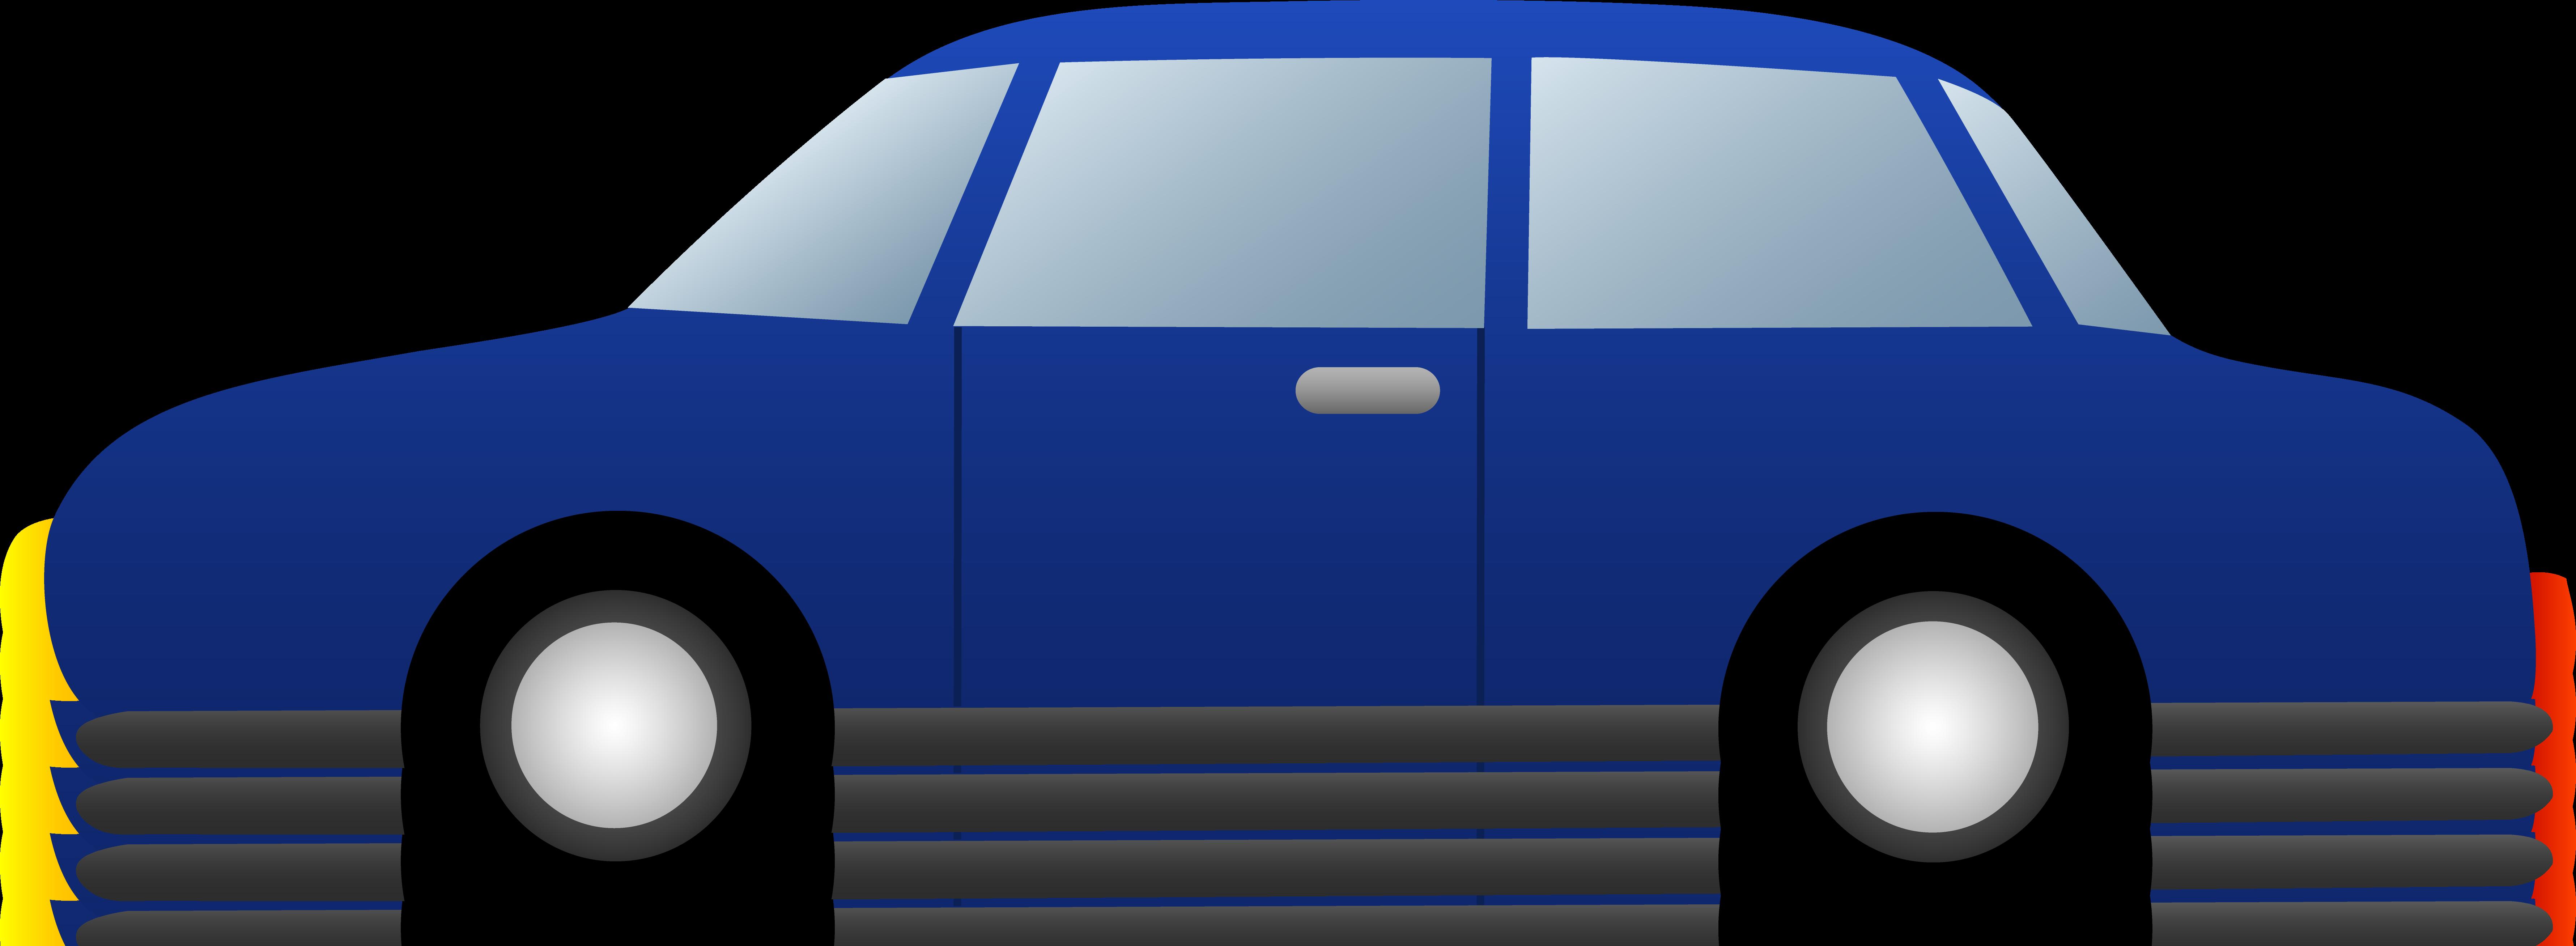 7122x2615 Ferarri Clipart Cool Car